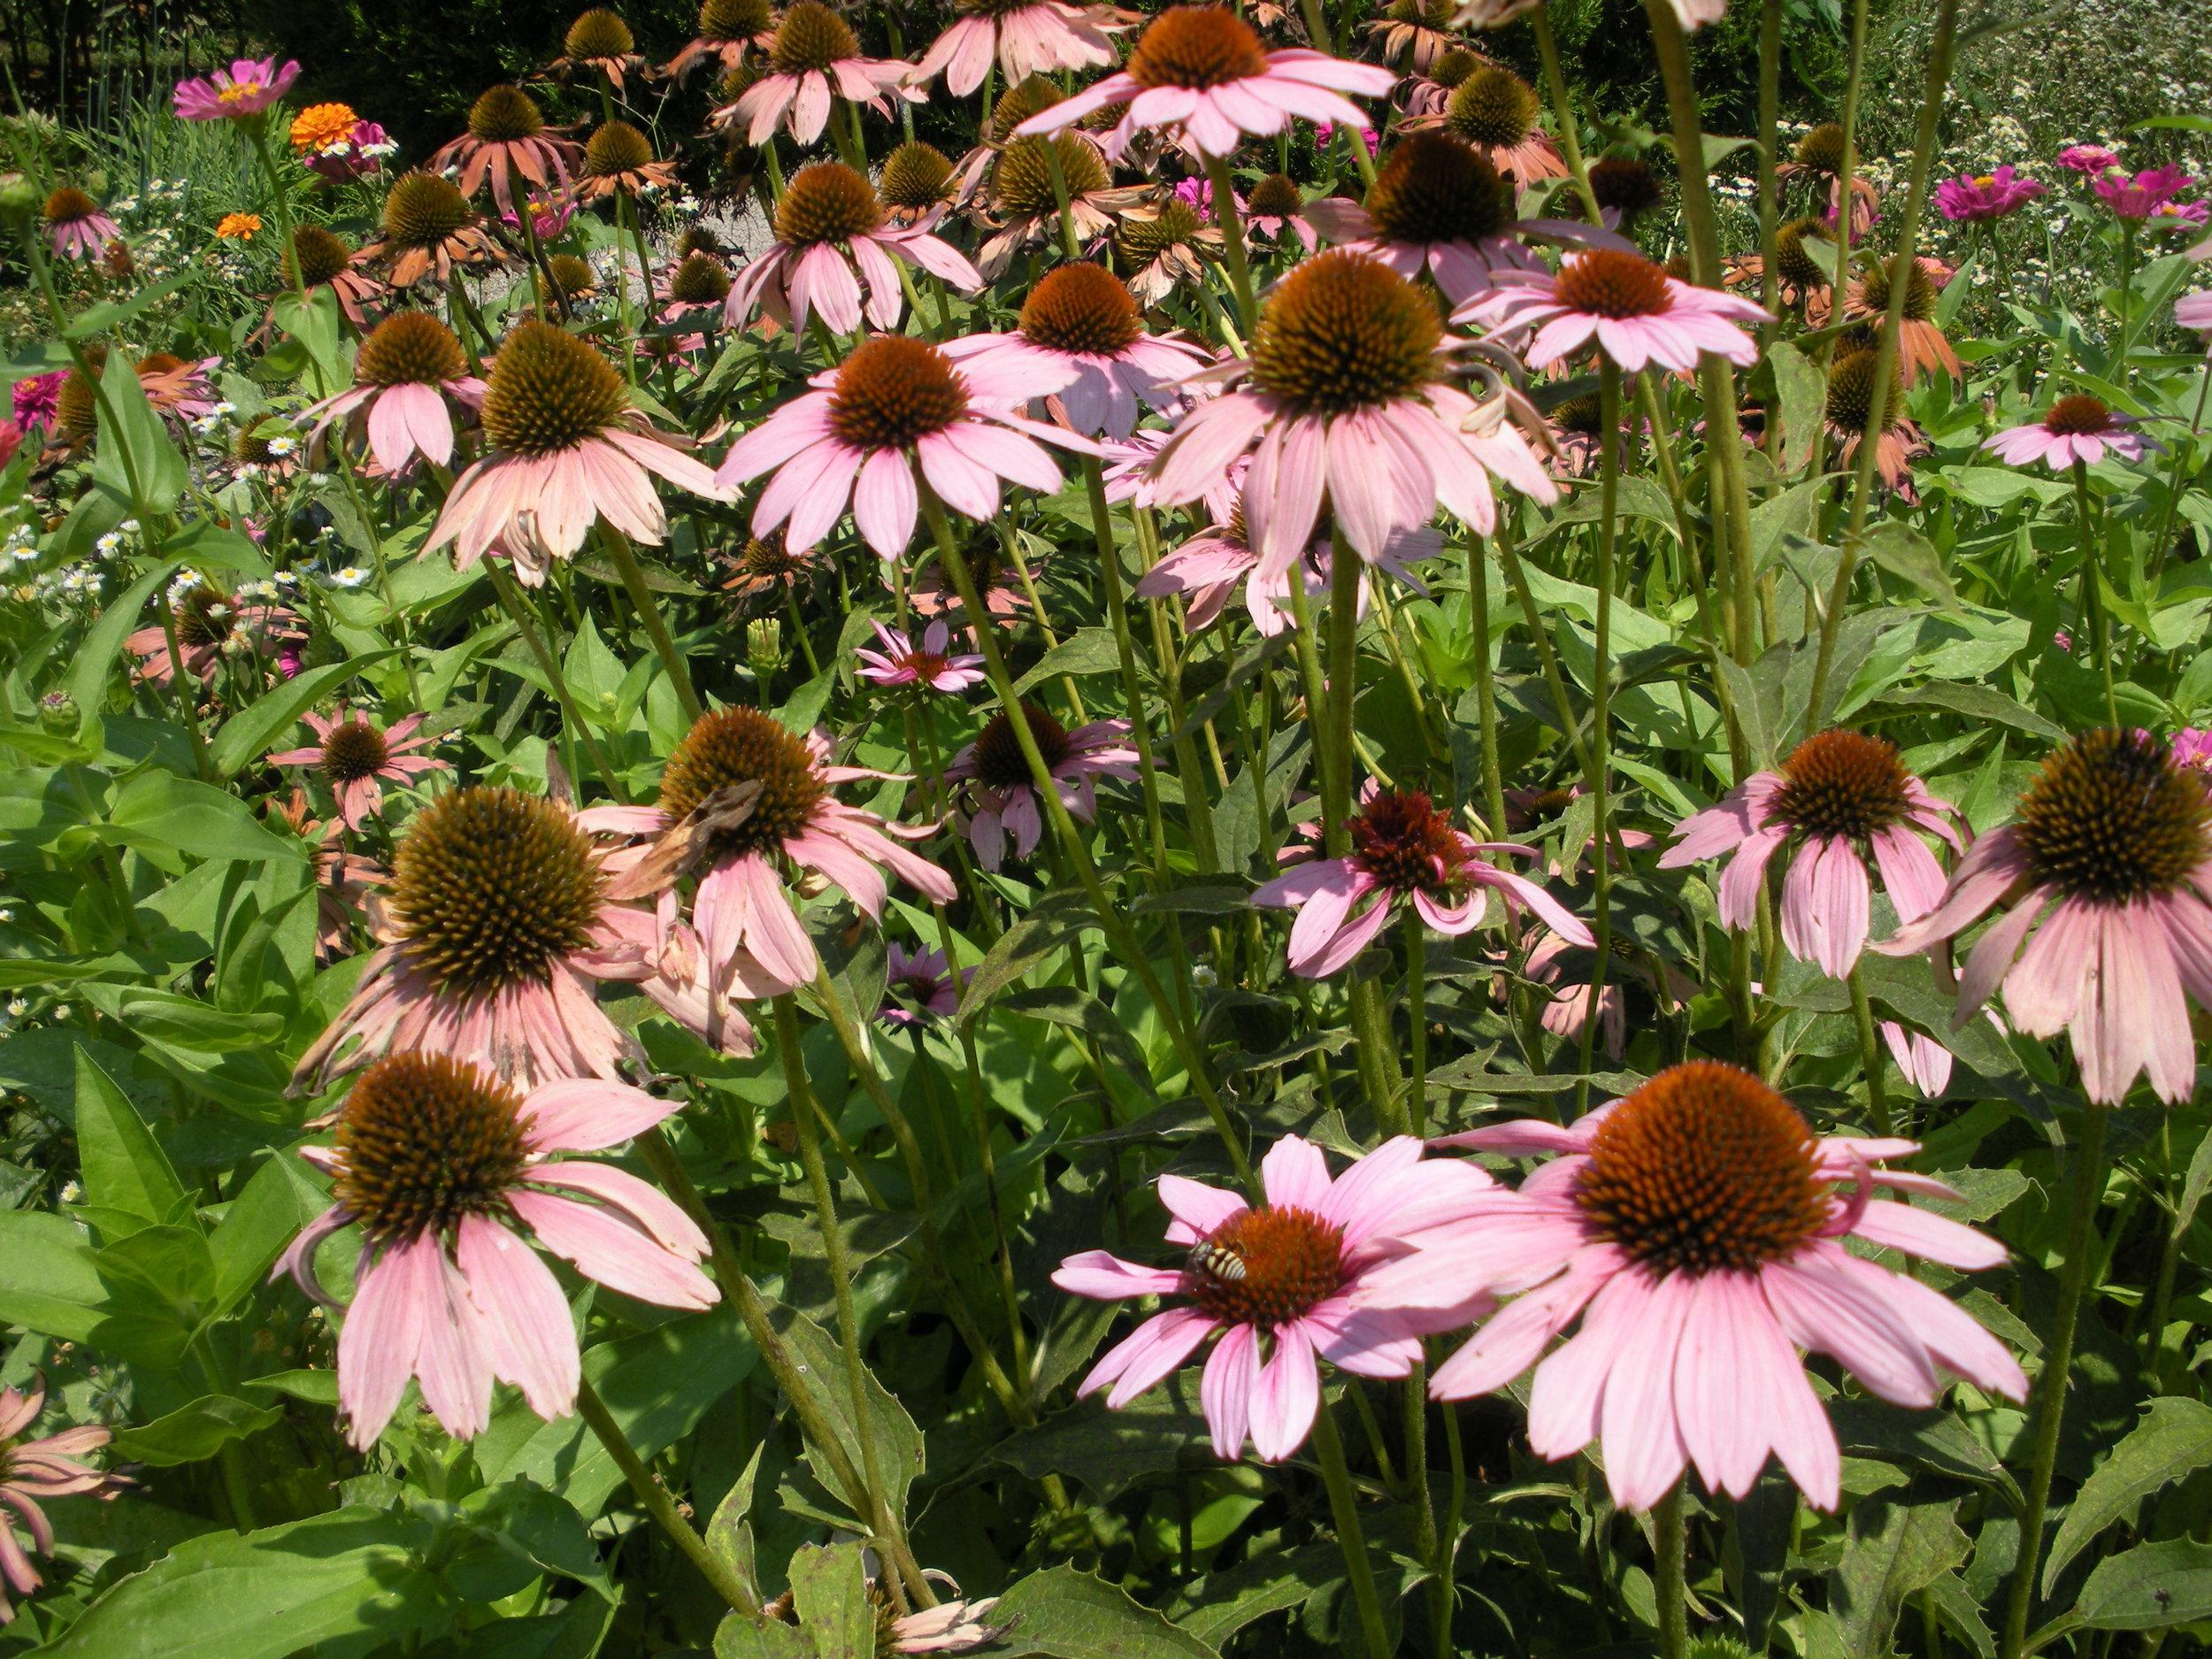 Coneflower in bloom